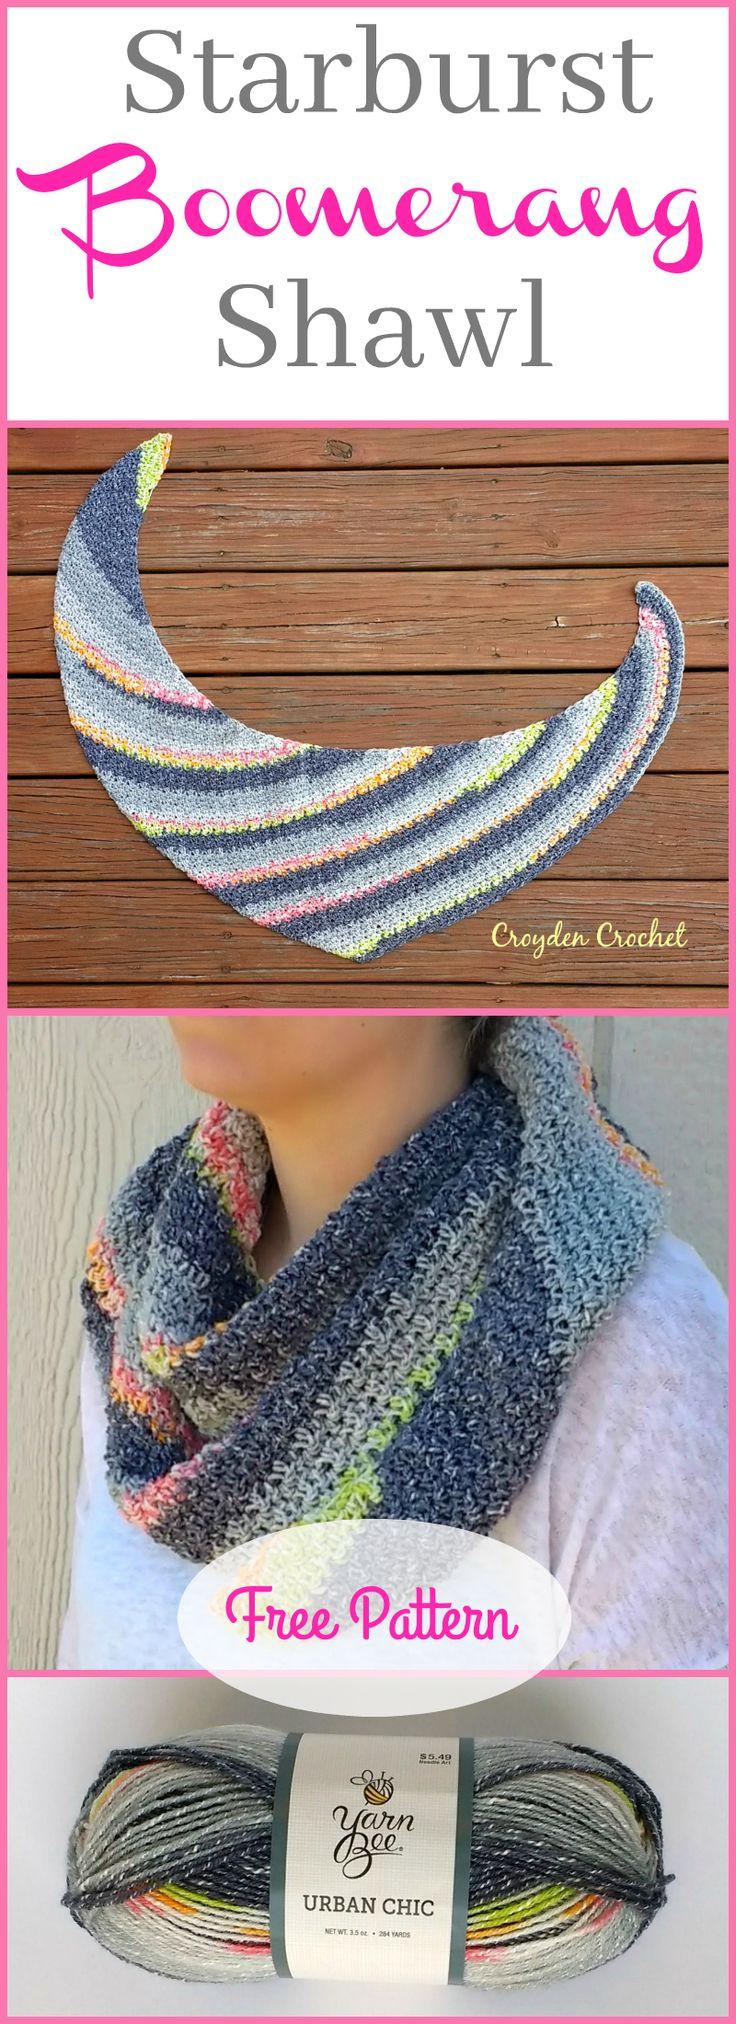 718 best crochet shawls and scarves images on pinterest crochet boomerang scarf crochet pattern bankloansurffo Gallery